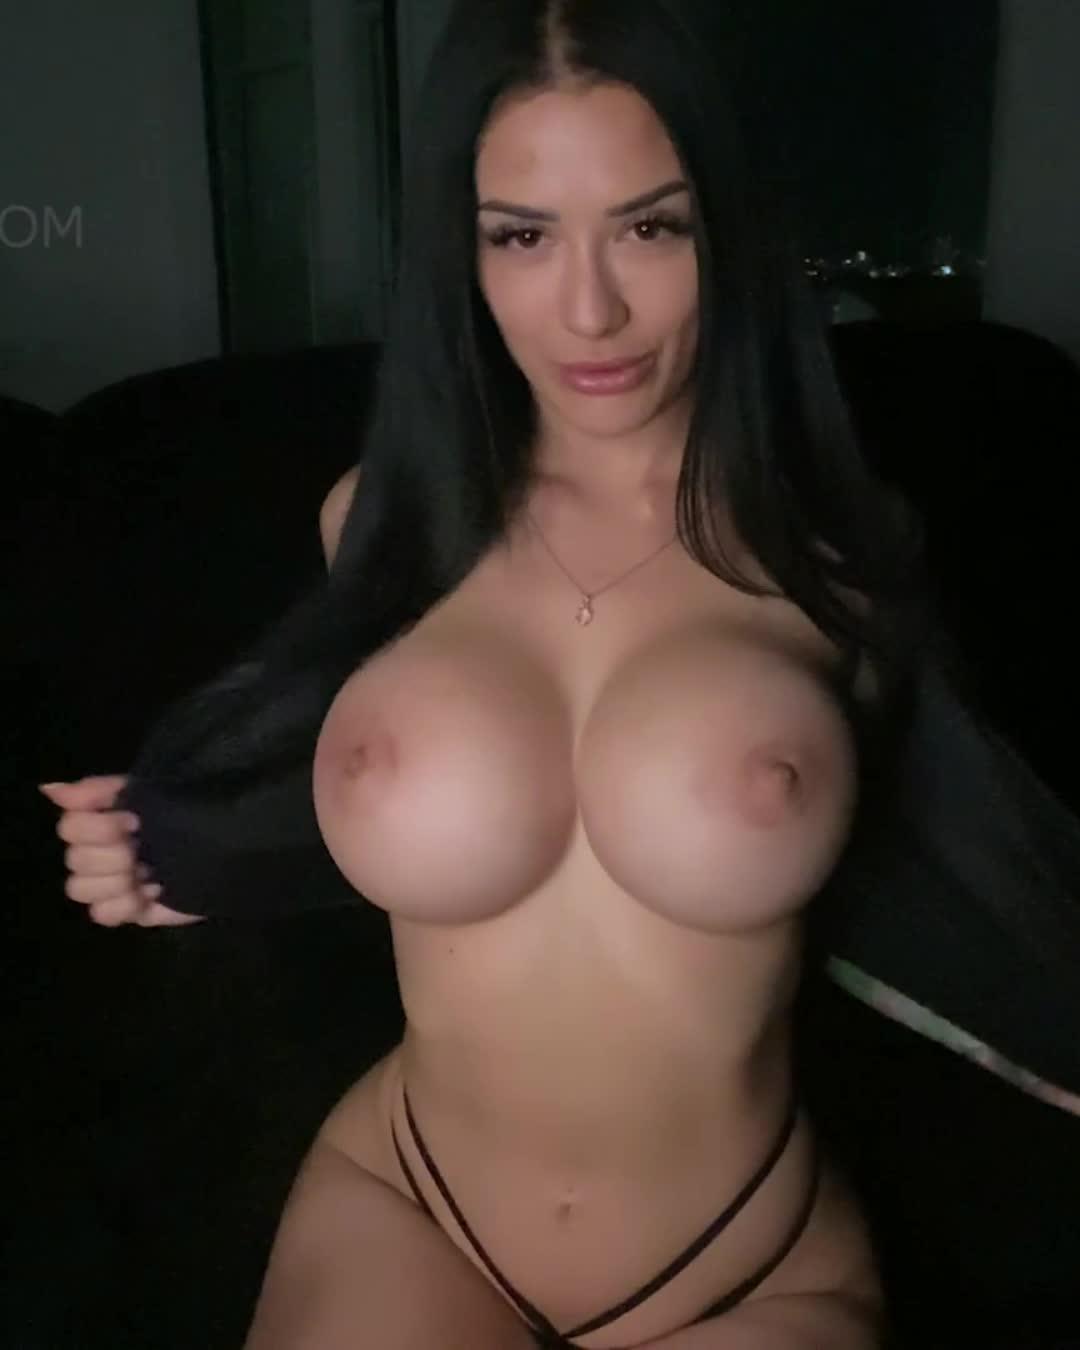 Katrina Jade's New Boobies in all their glory